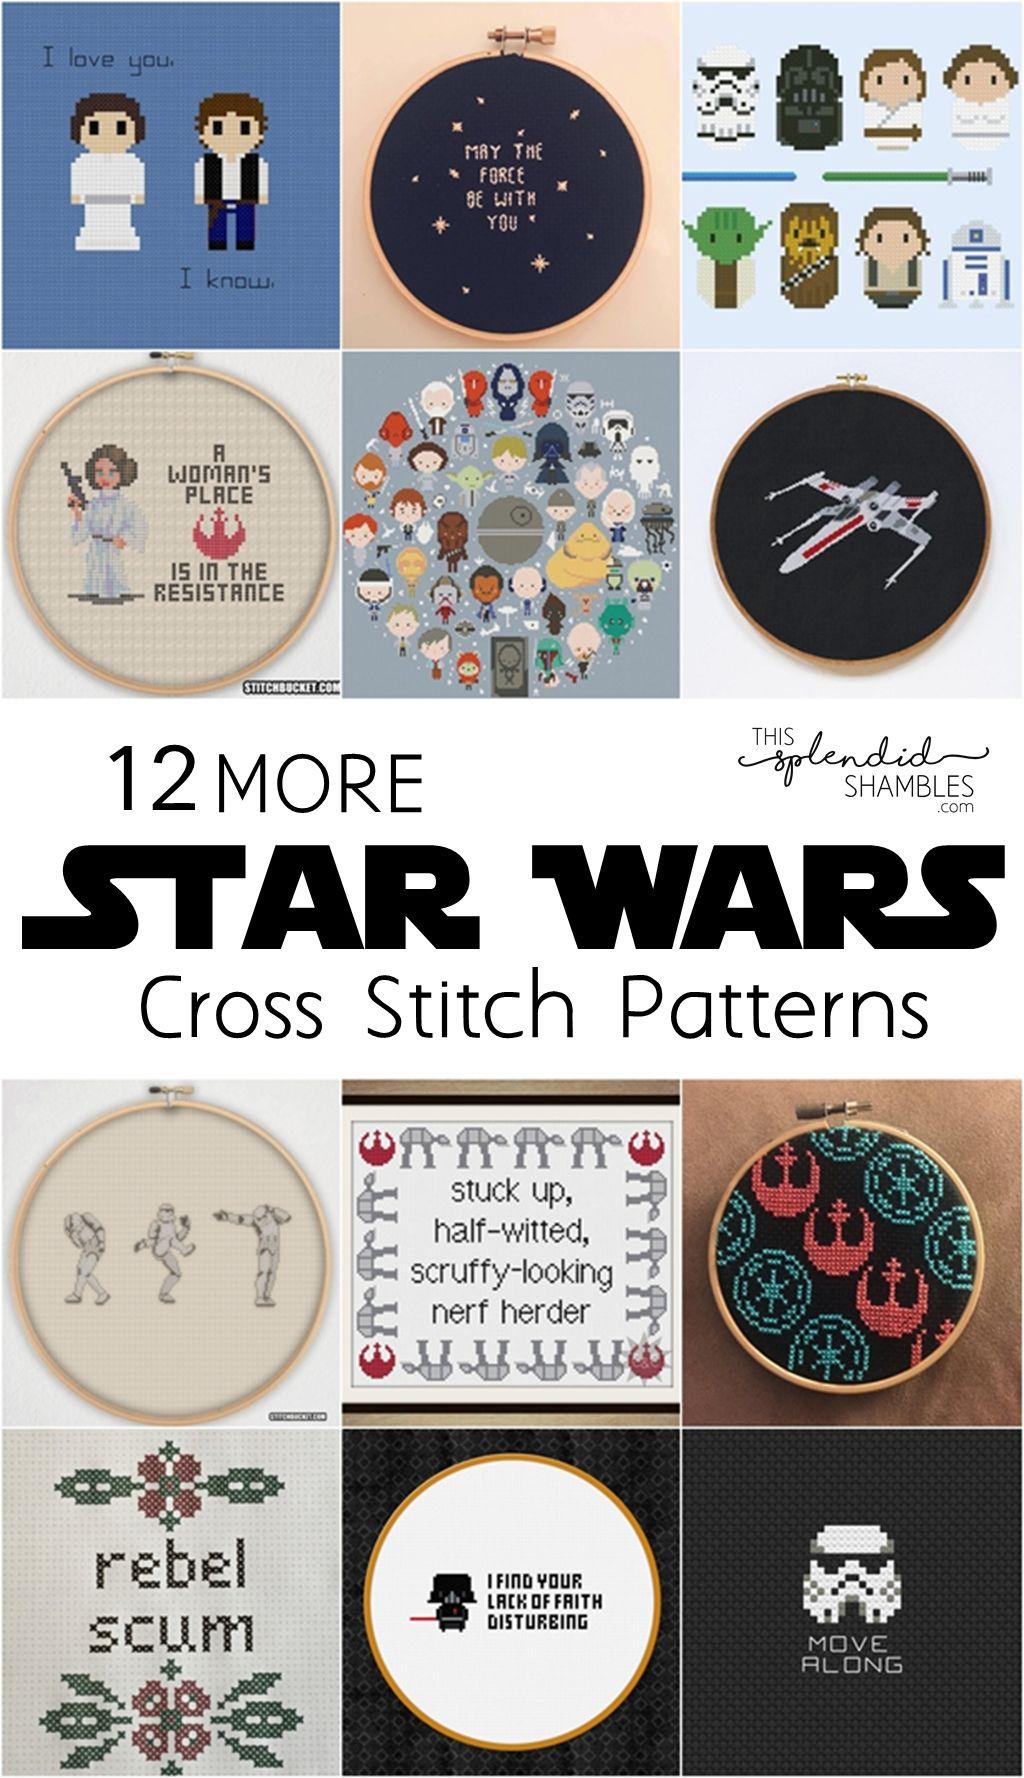 12 more star wars cross stitch patterns on This Splendid Shambles